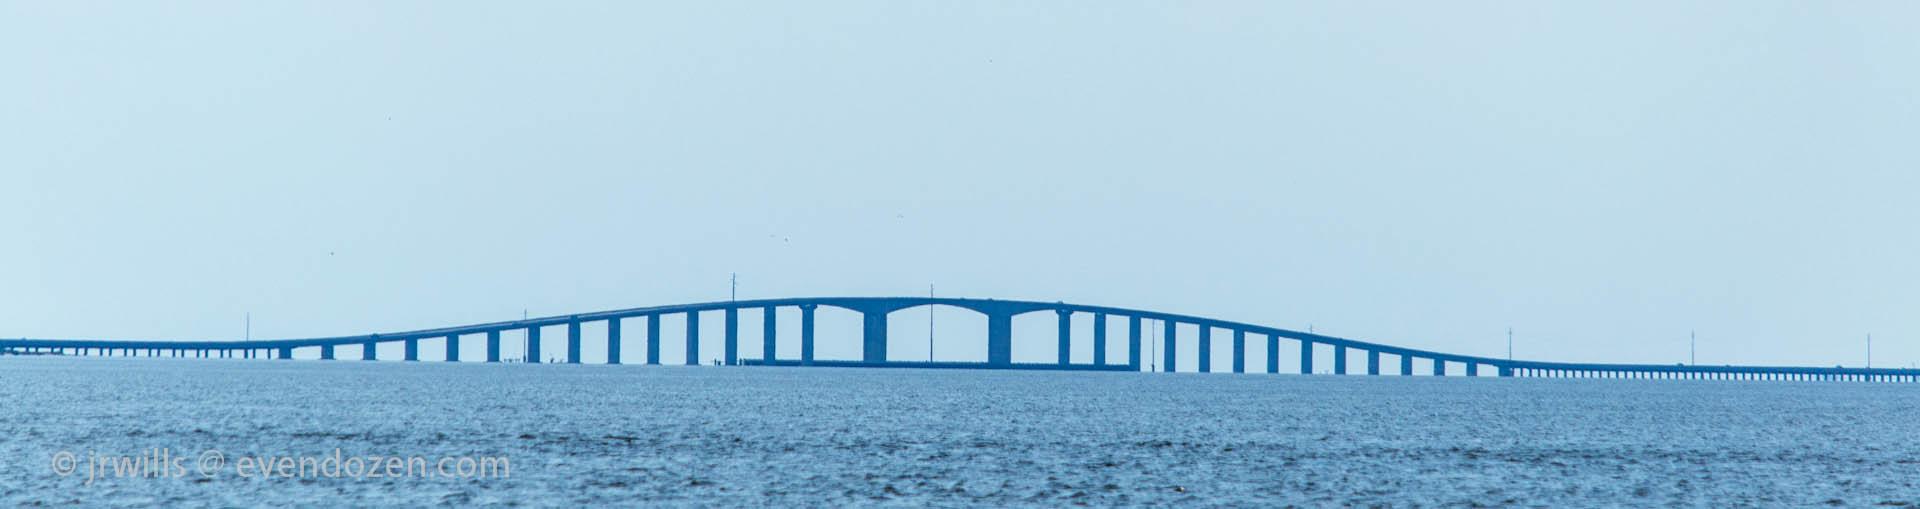 Dauphin Island bridge.